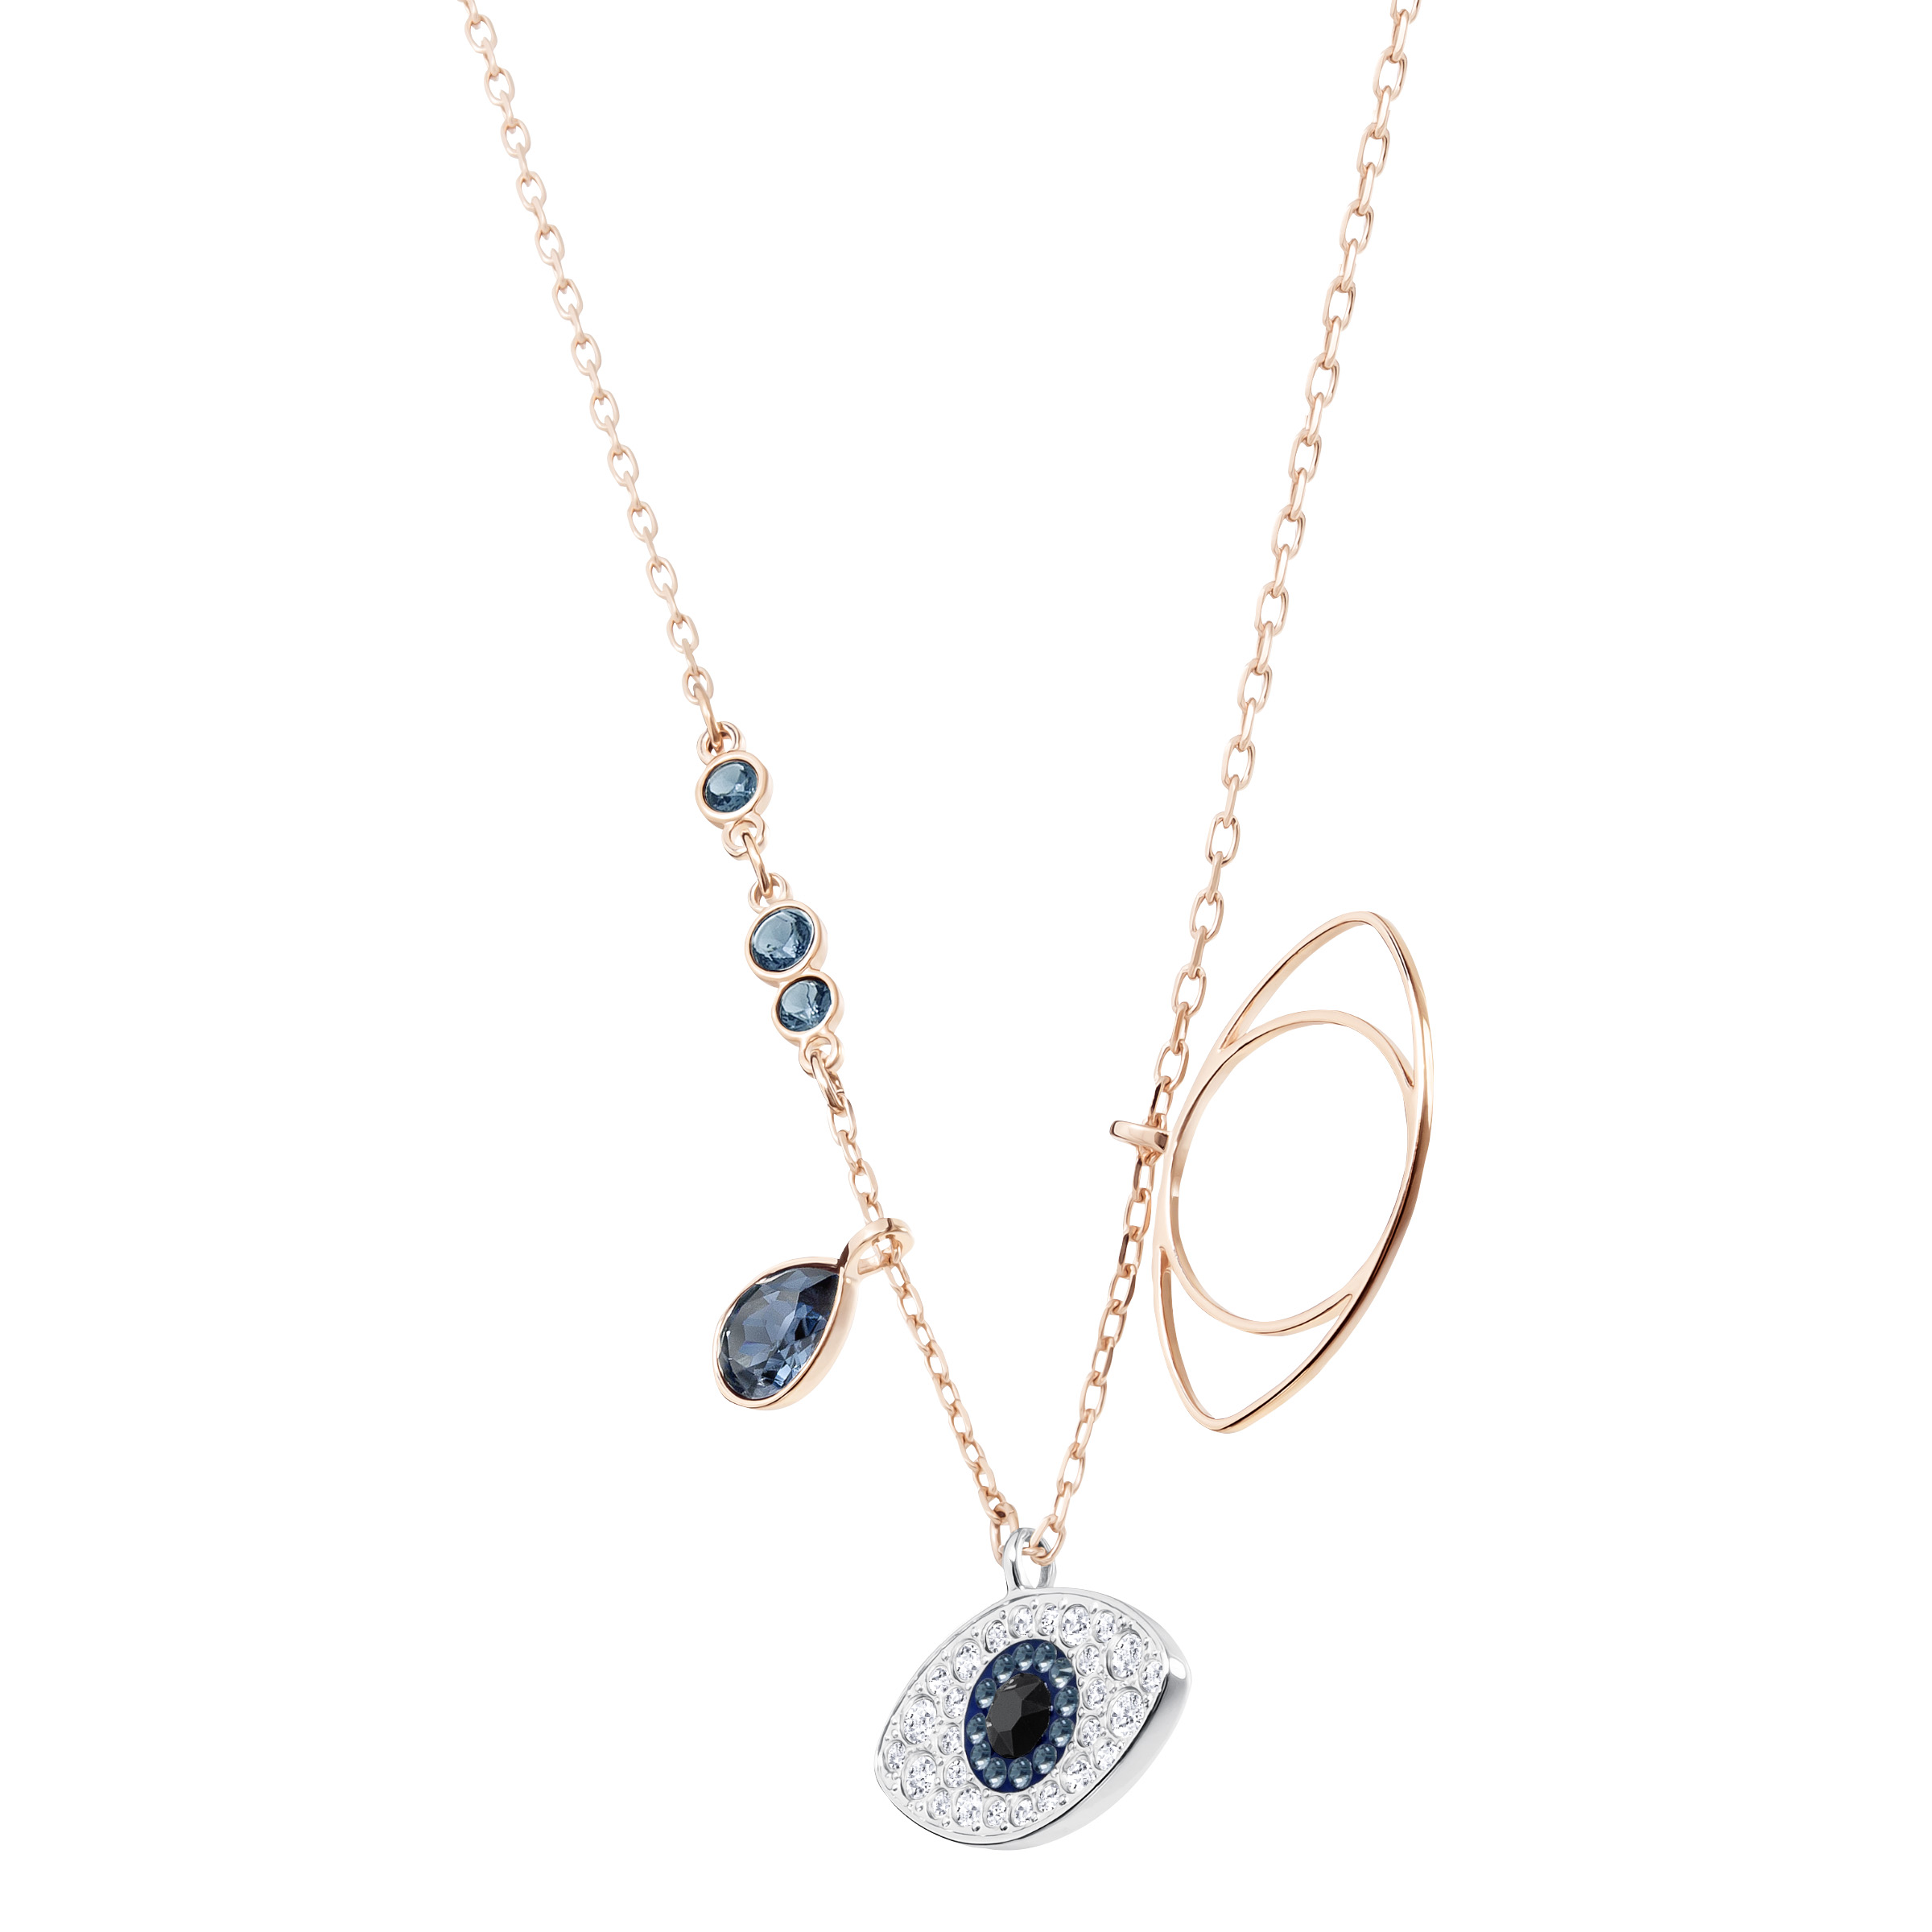 Pendentif Swarovski Symbolic Evil Eye, bleu, Finition mix de métal Swarovski